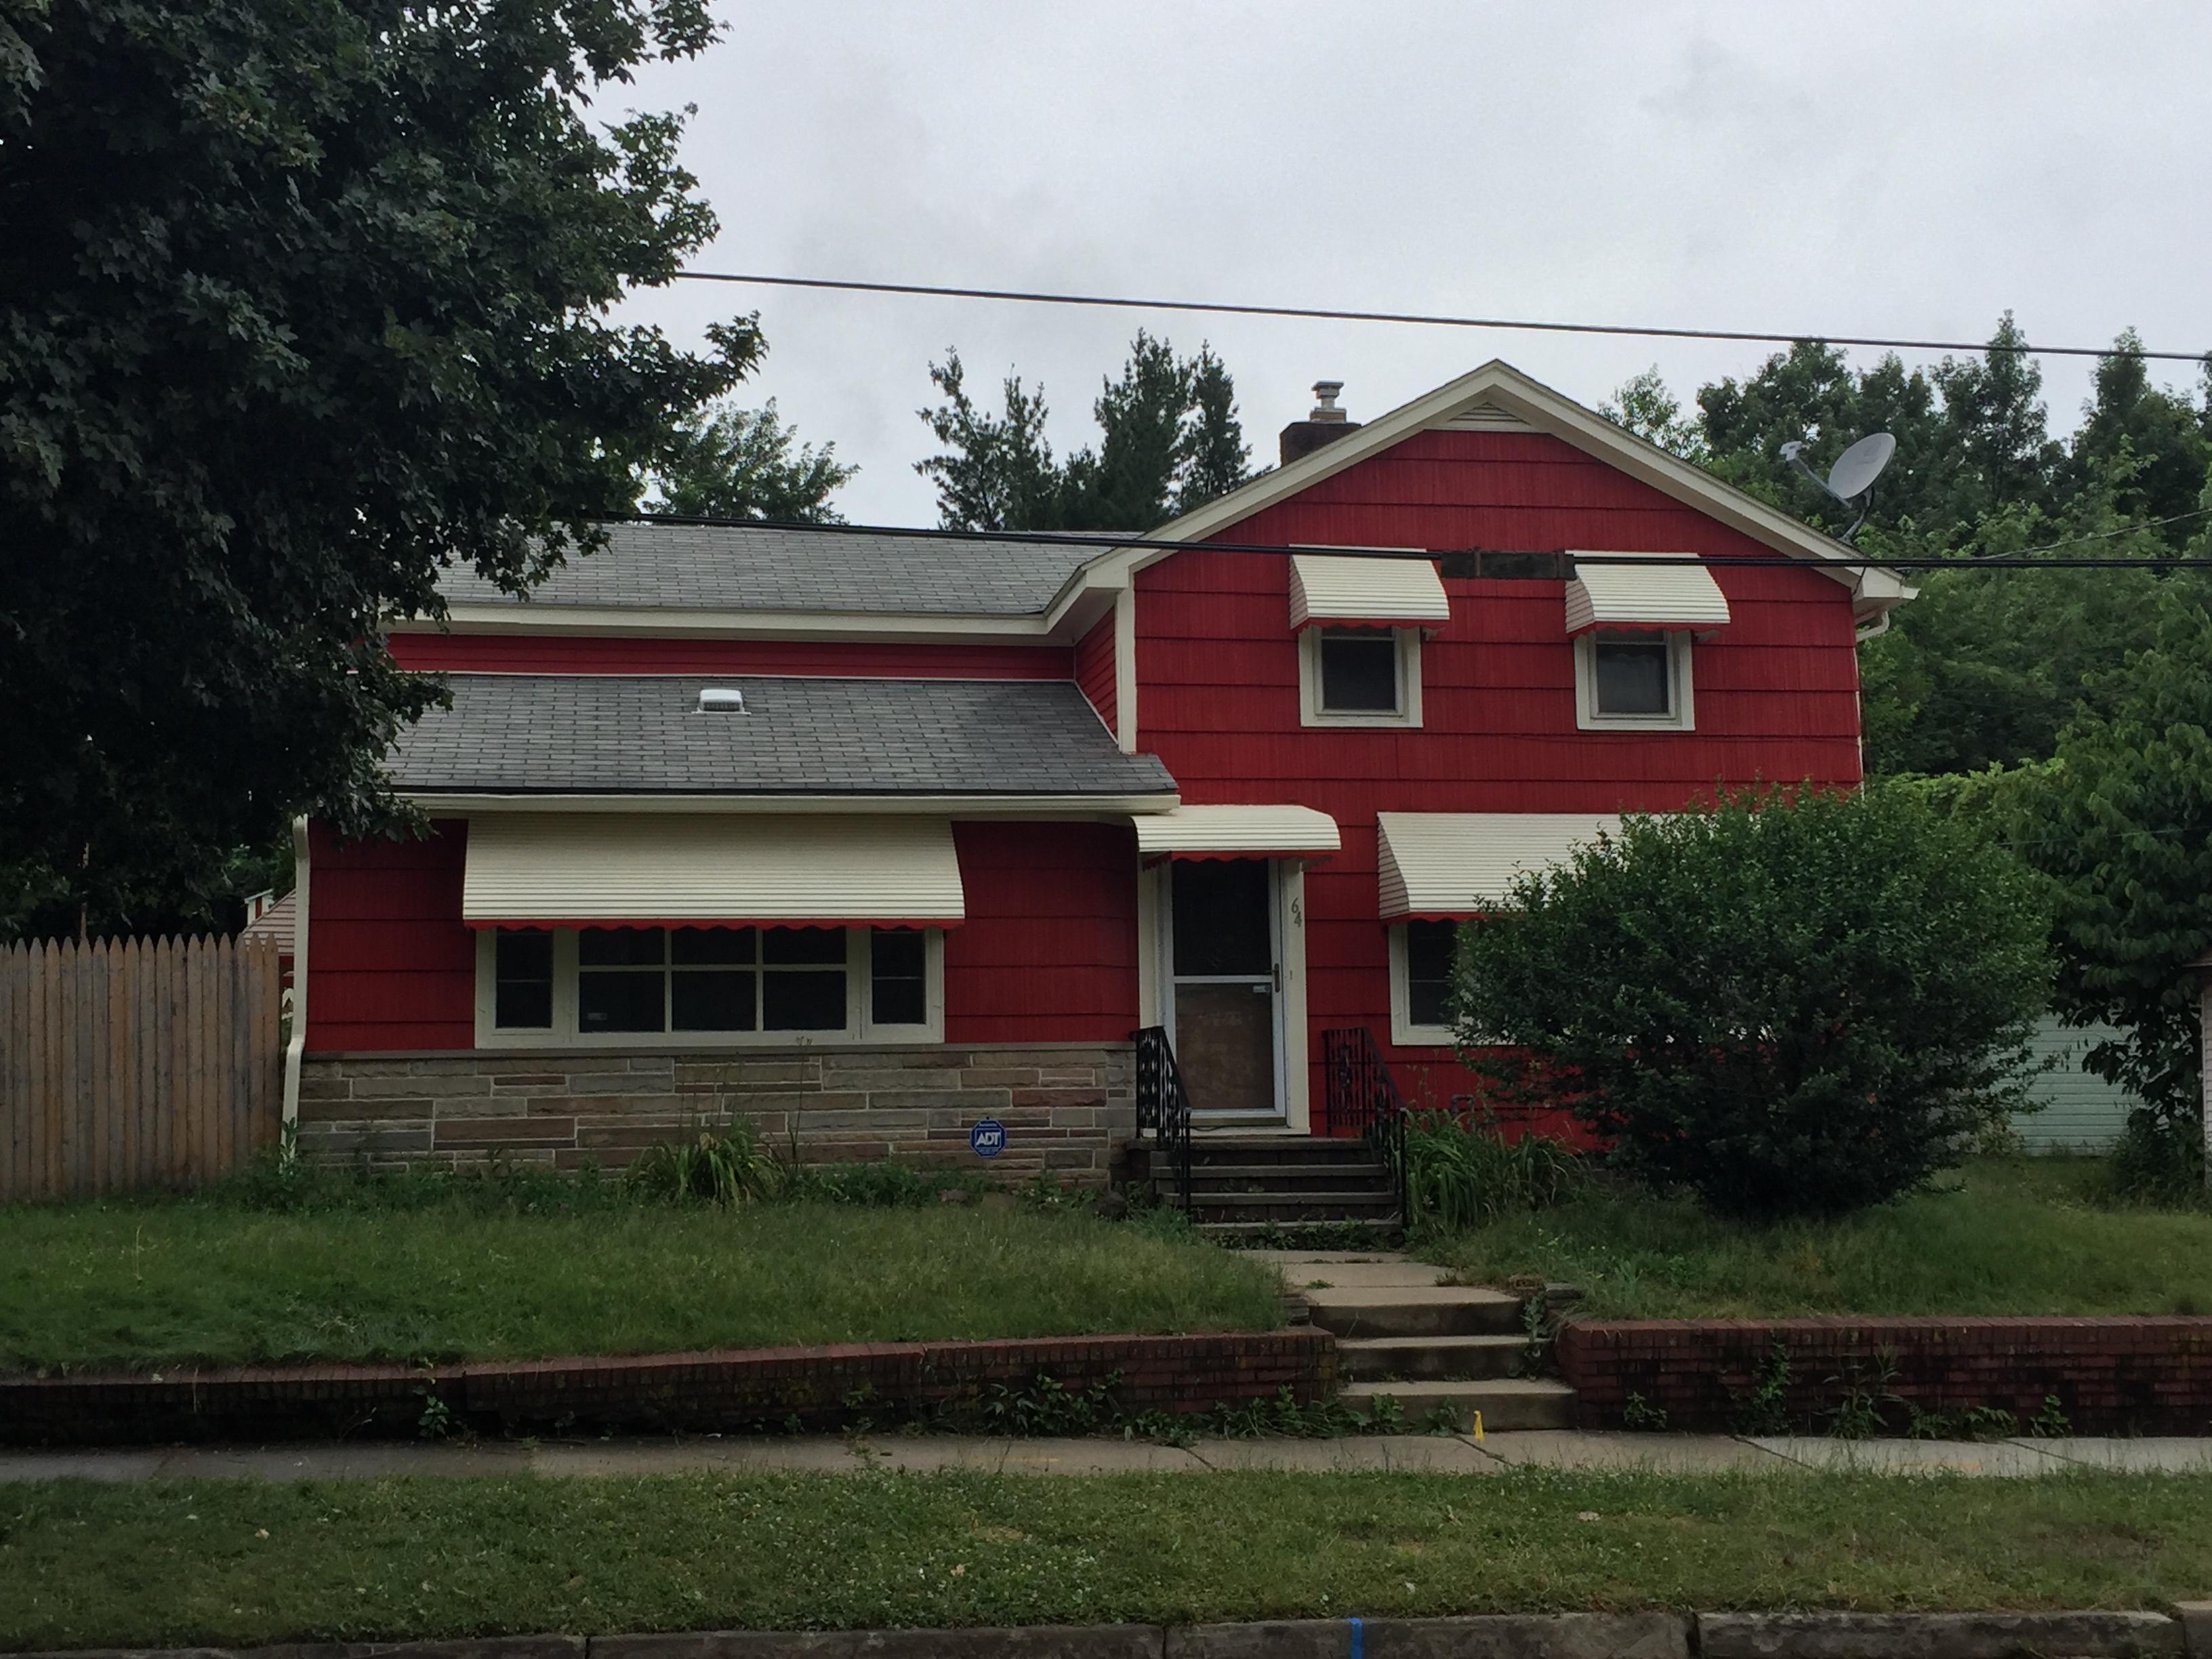 64 Forrest St, Akron, 44306